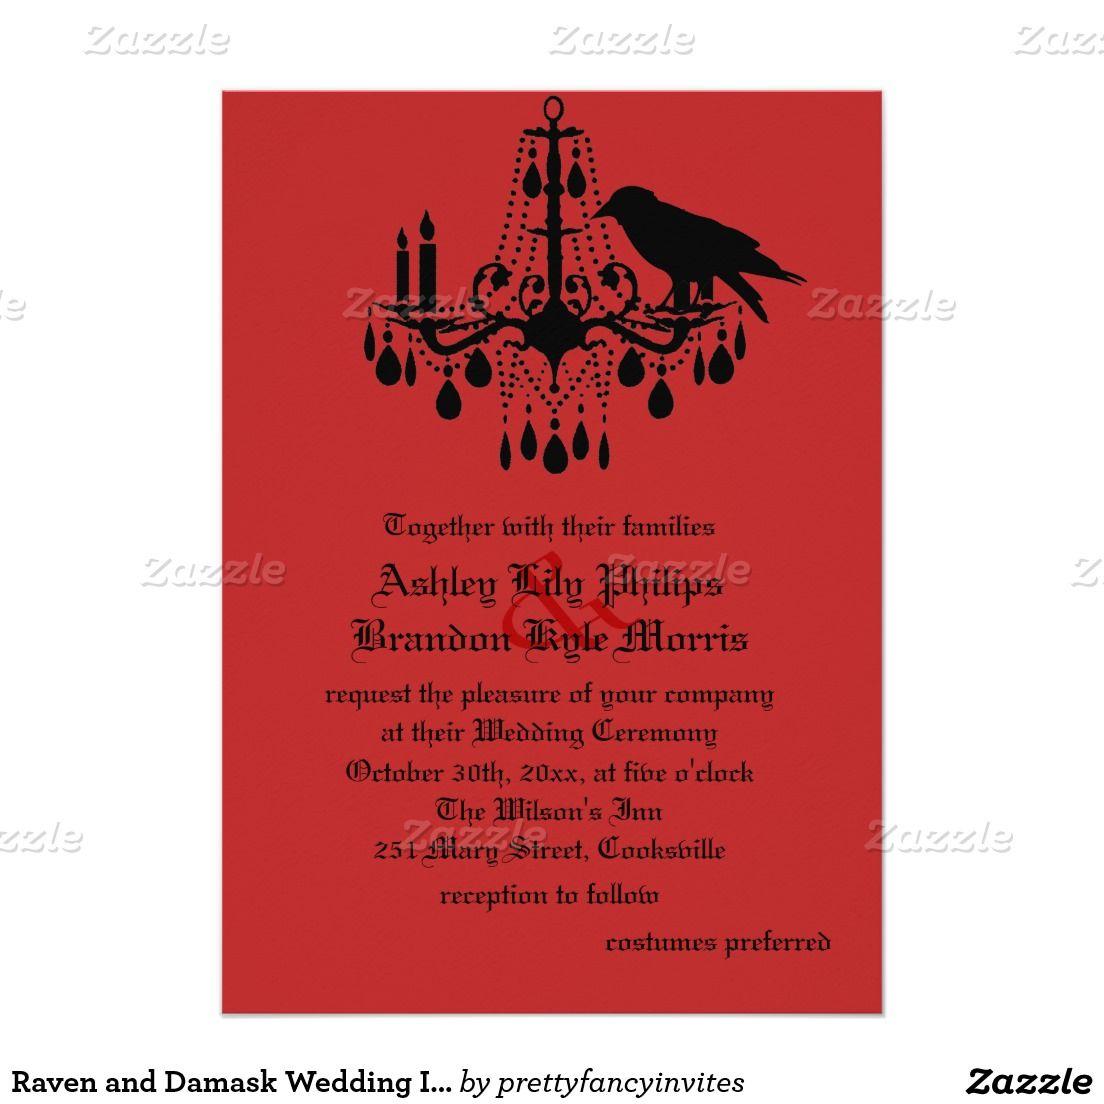 Raven and Damask Wedding Invitation | Halloween weddings, Damasks ...